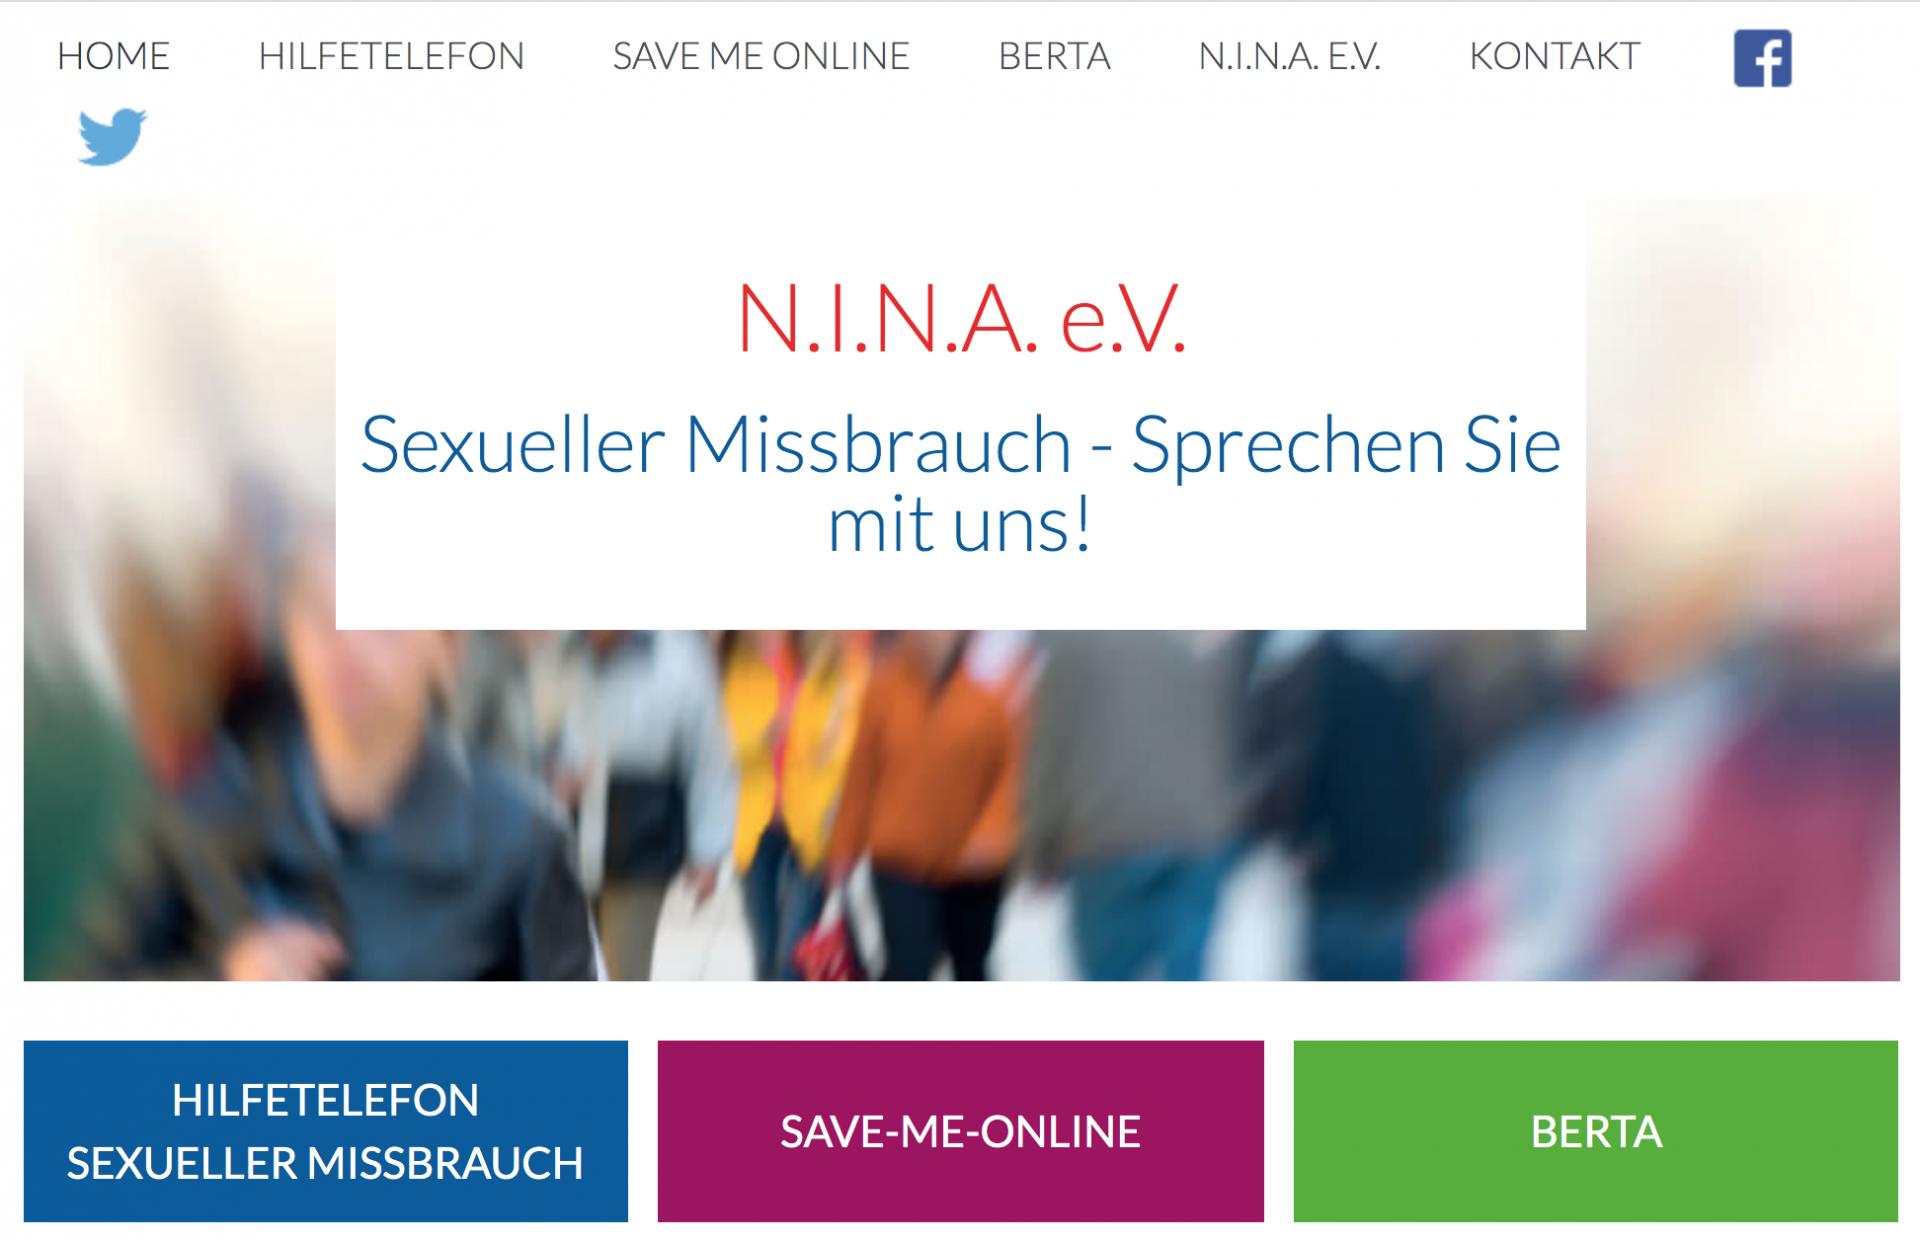 berta website